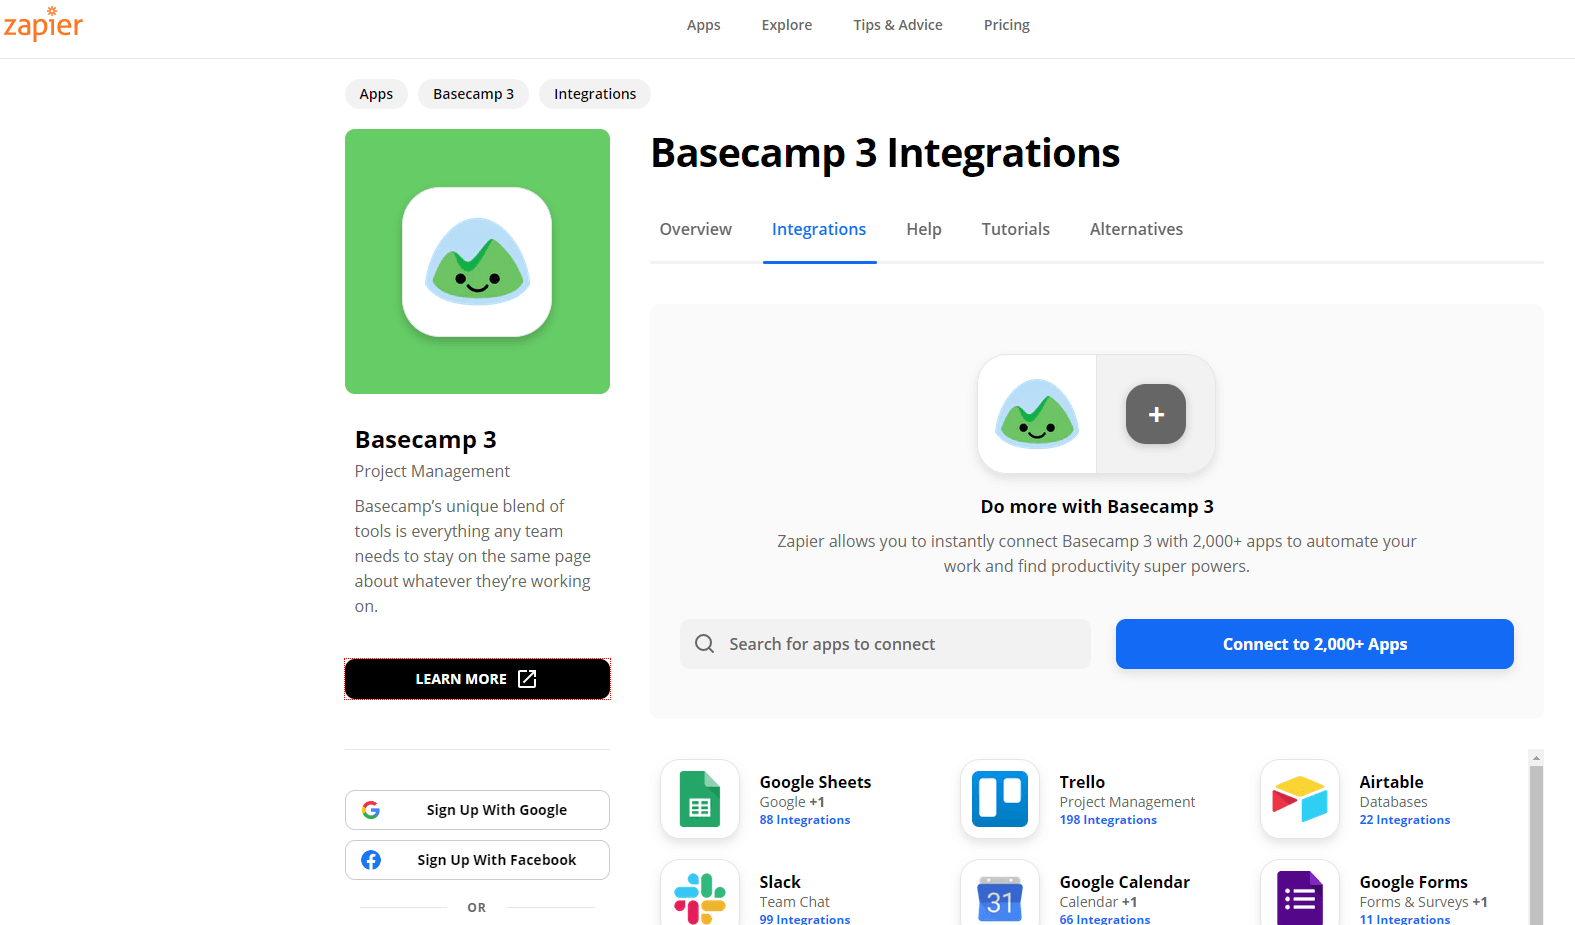 Basecamp integrations